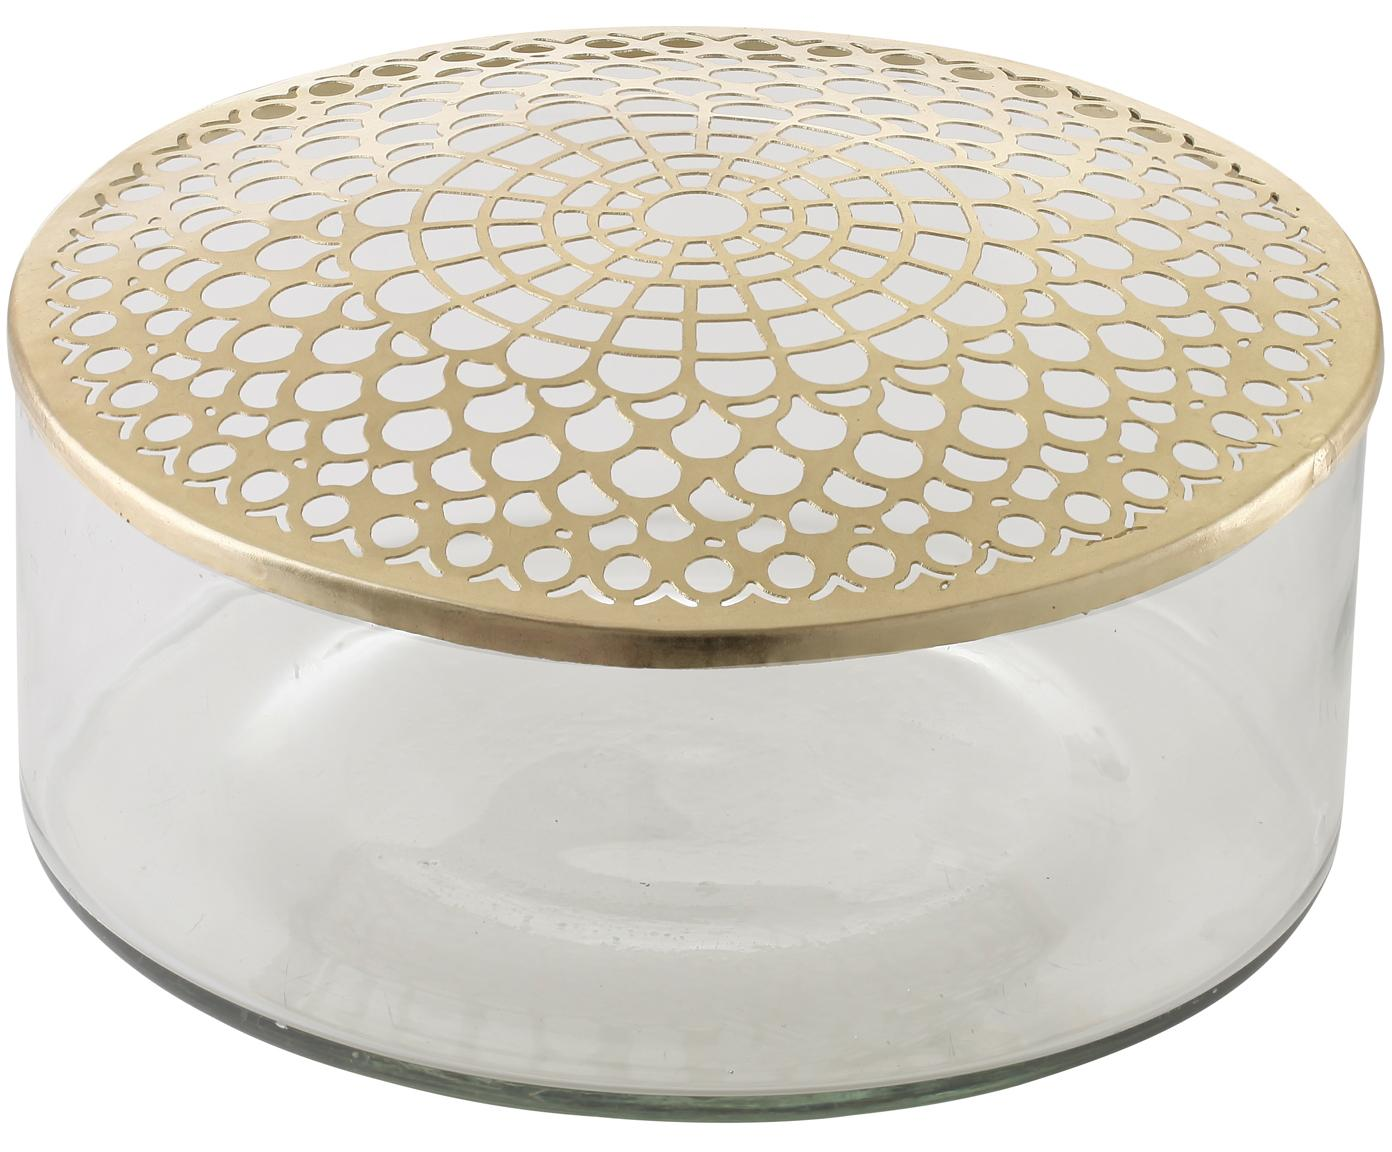 Vaso Kassandra, Vaso: vetro, Coperchio: acciaio inossidabile otto, Vaso: trasparente Coperchio: ottone, Ø 21 x Alt. 10 cm